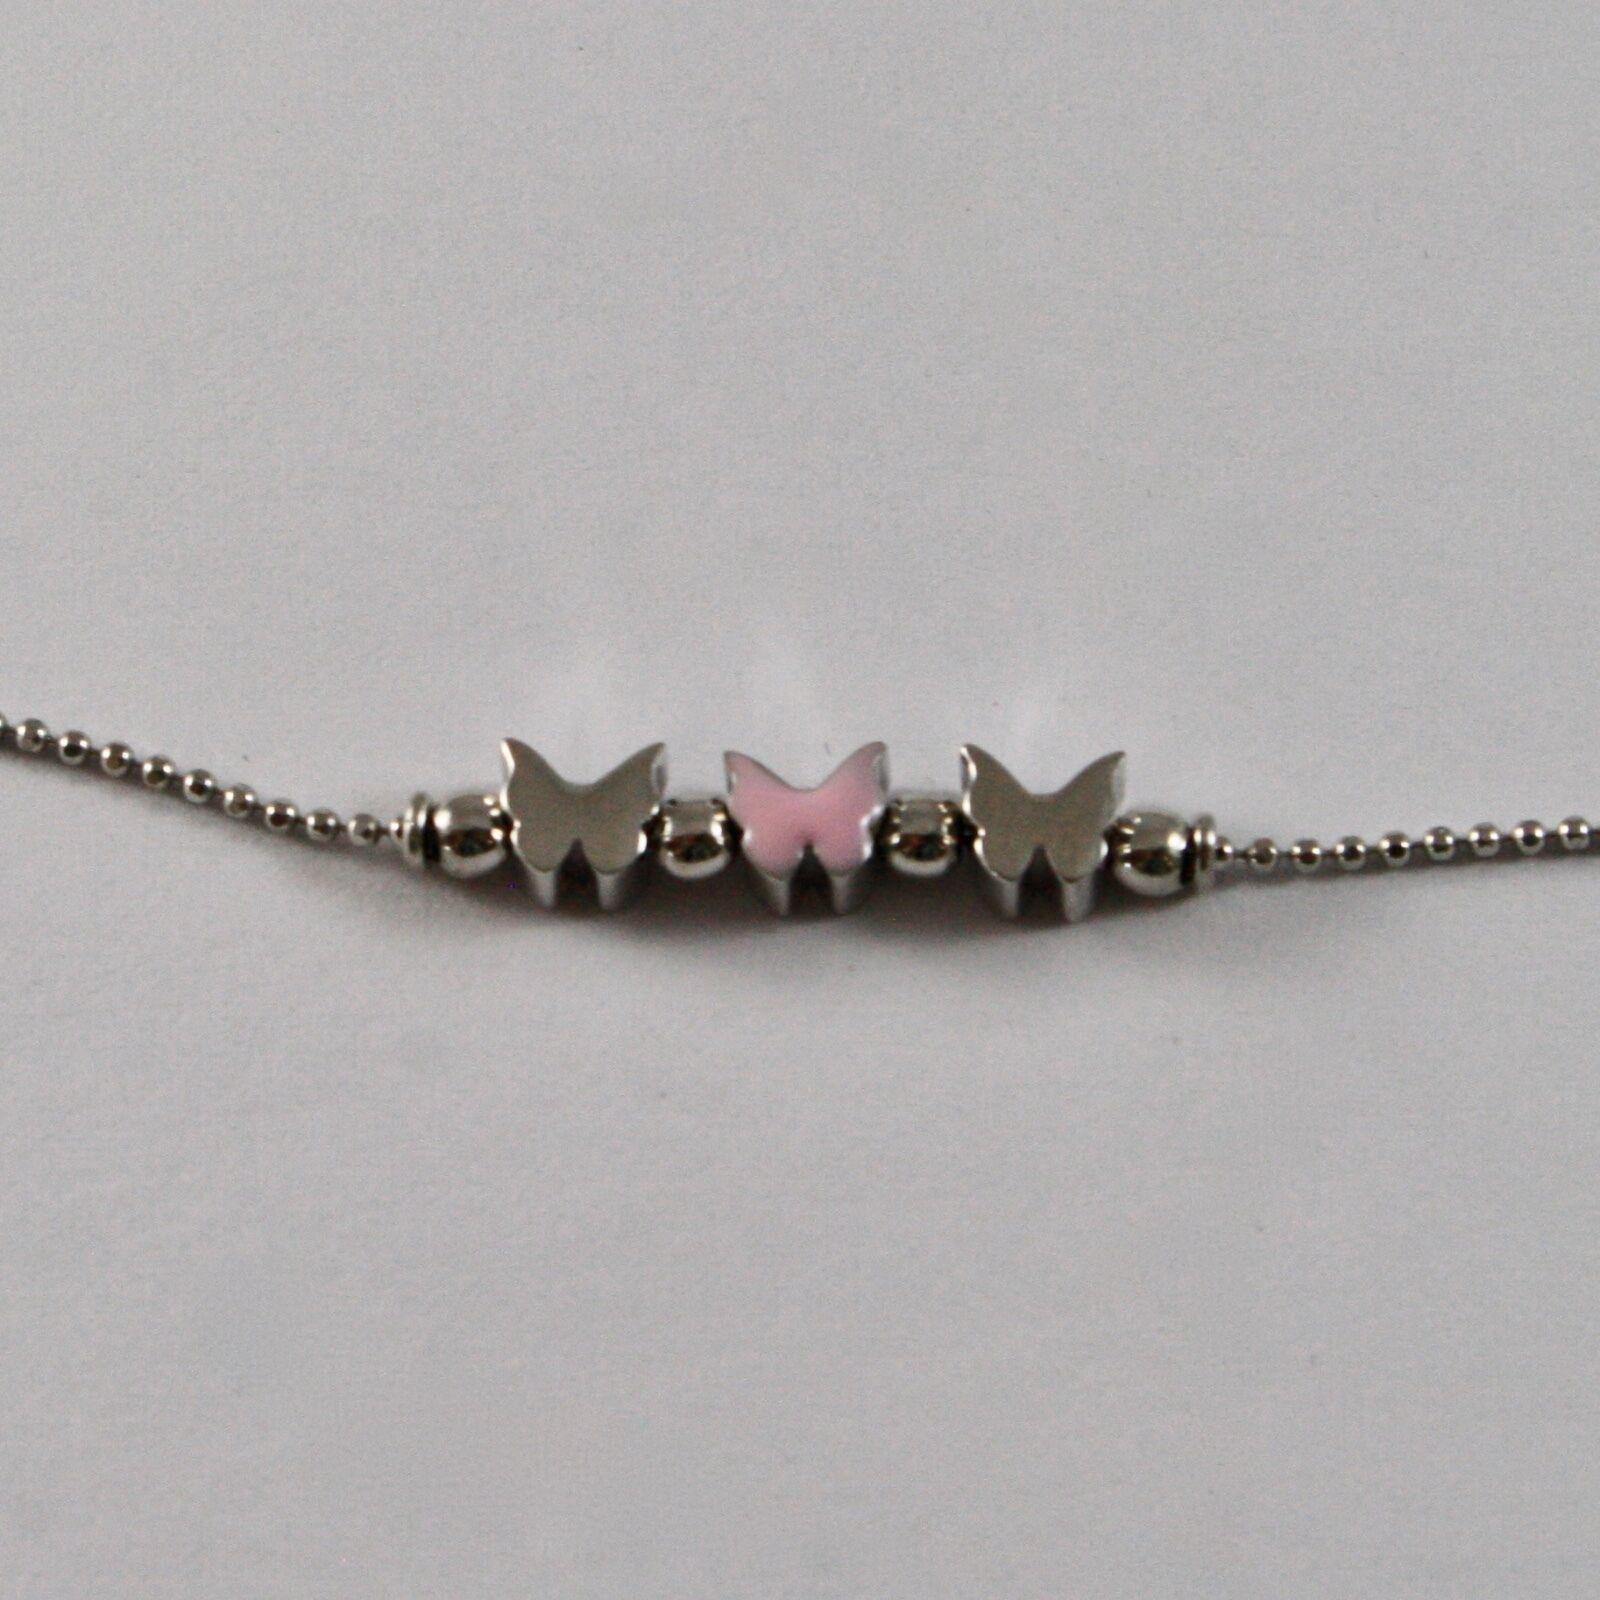 Silver Bracelet 925 Jack&co Butterflies Stylized Balls Faceted JCB0902 image 4